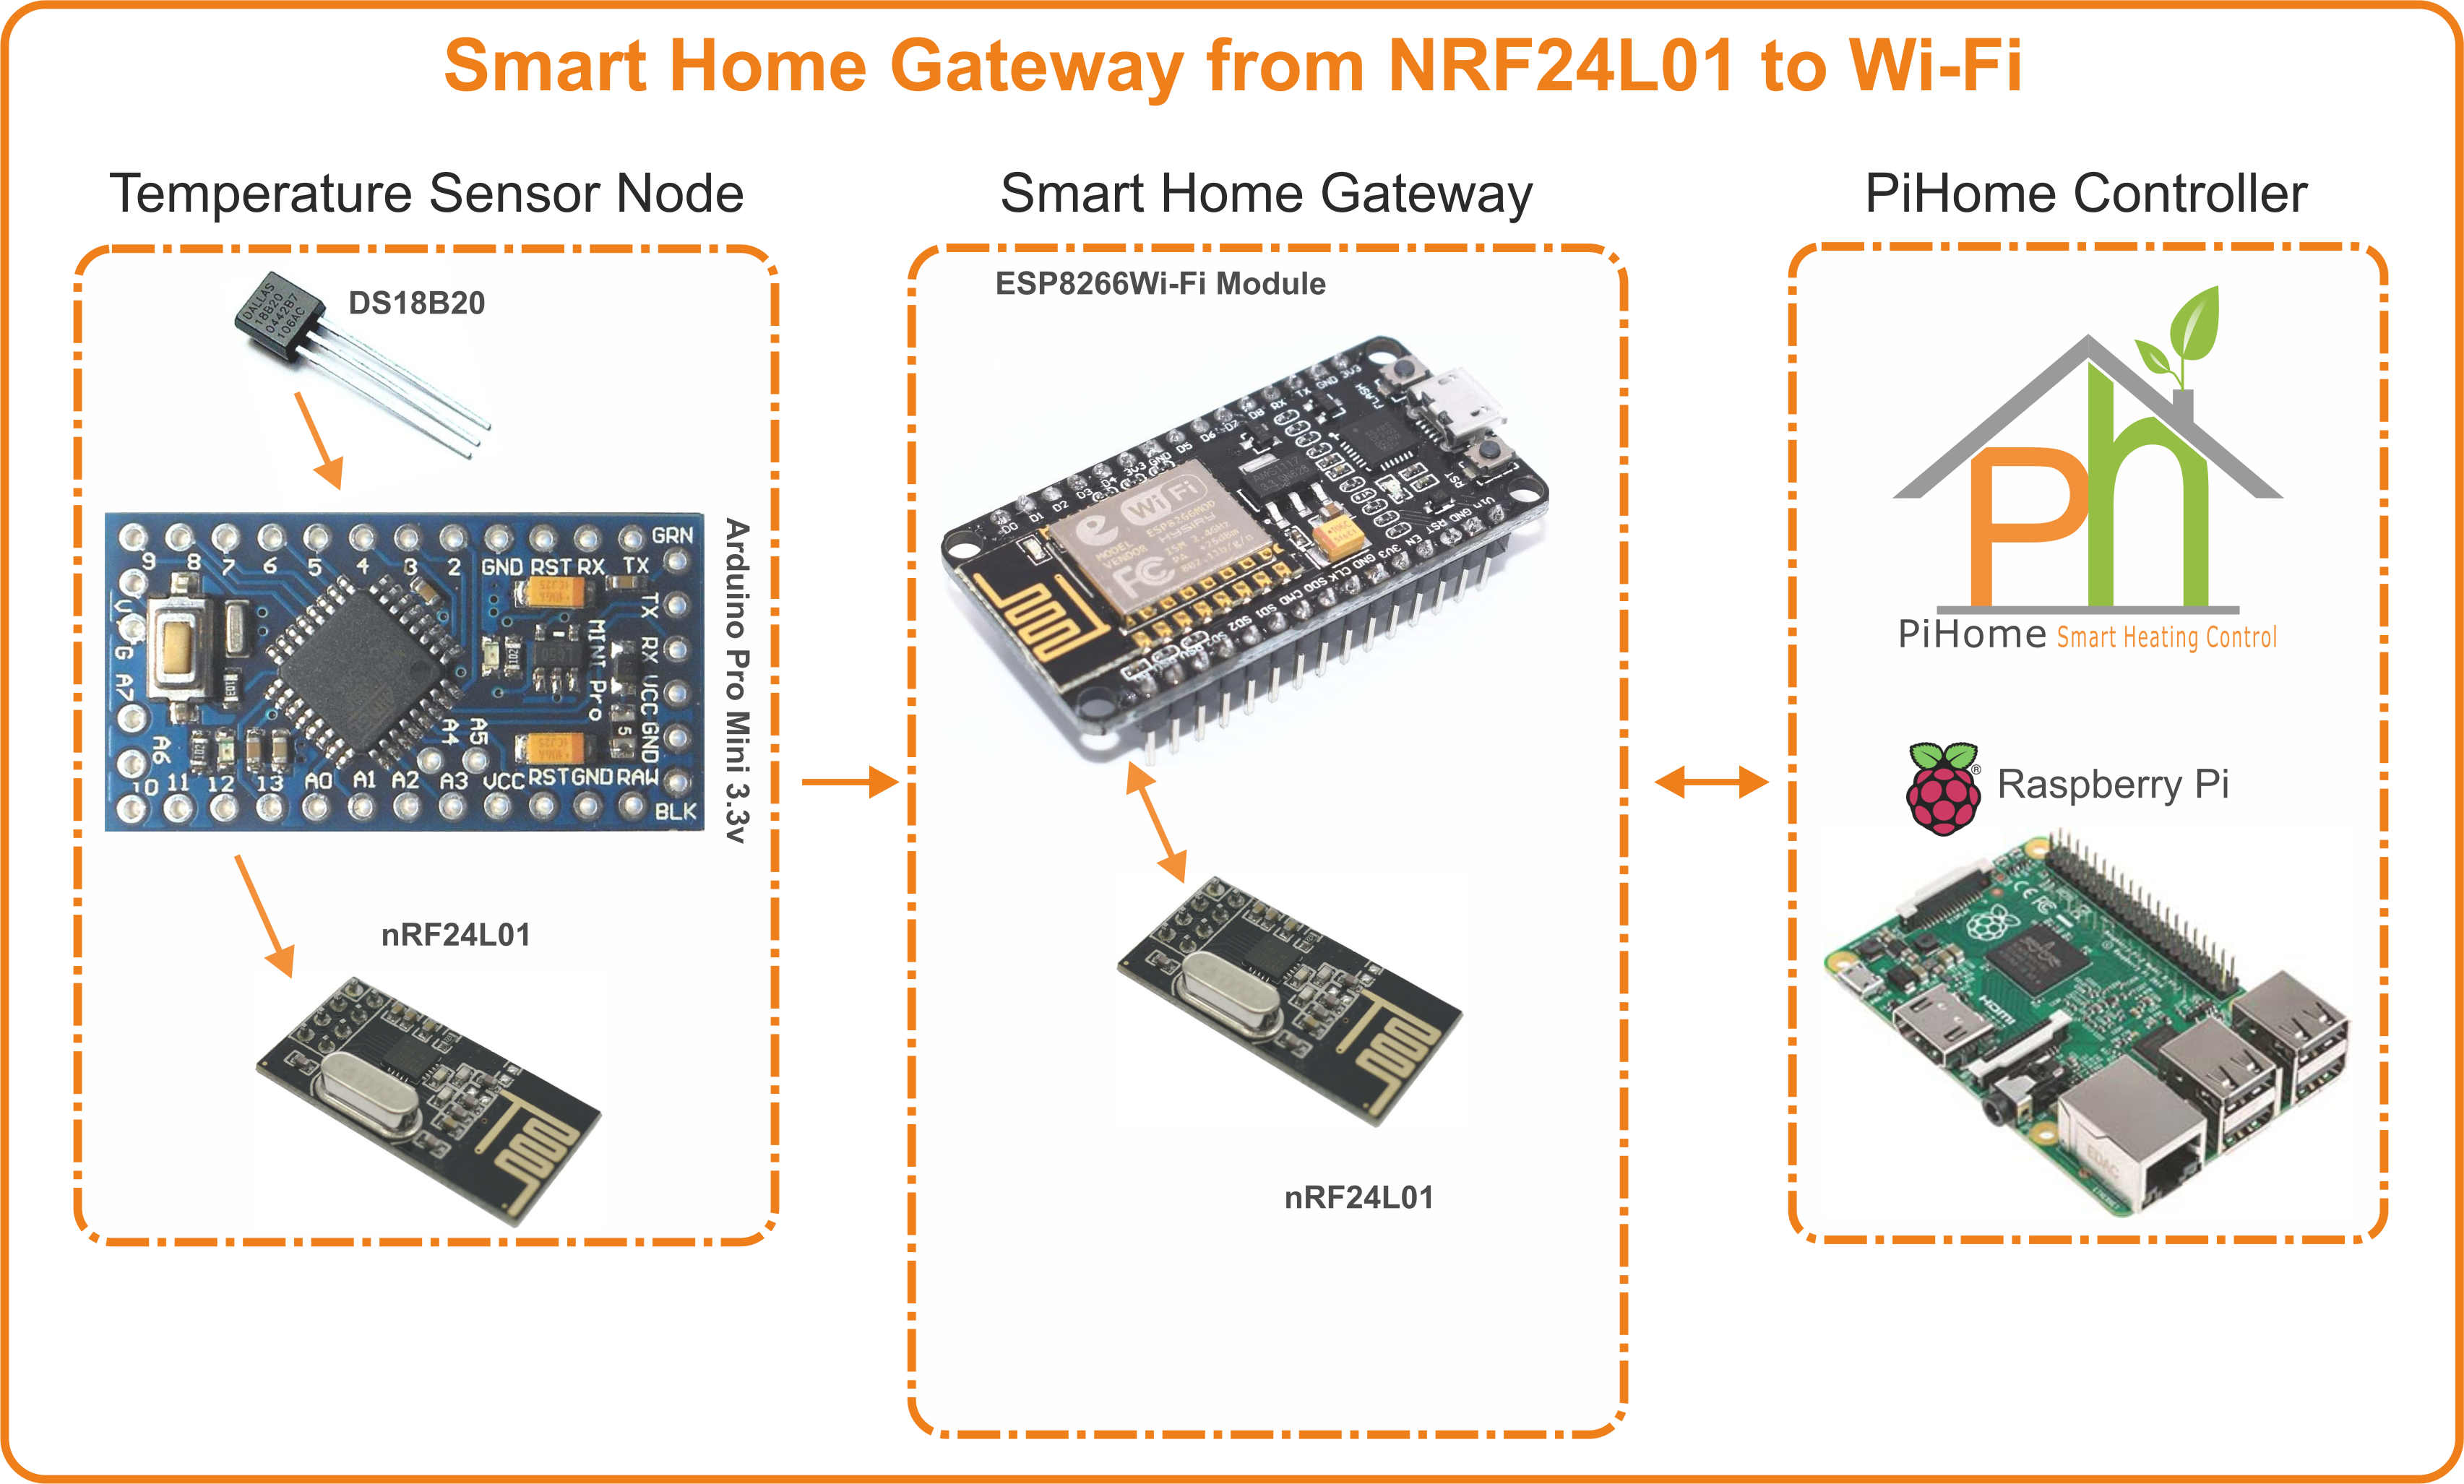 WiFi Smart Home Gateway